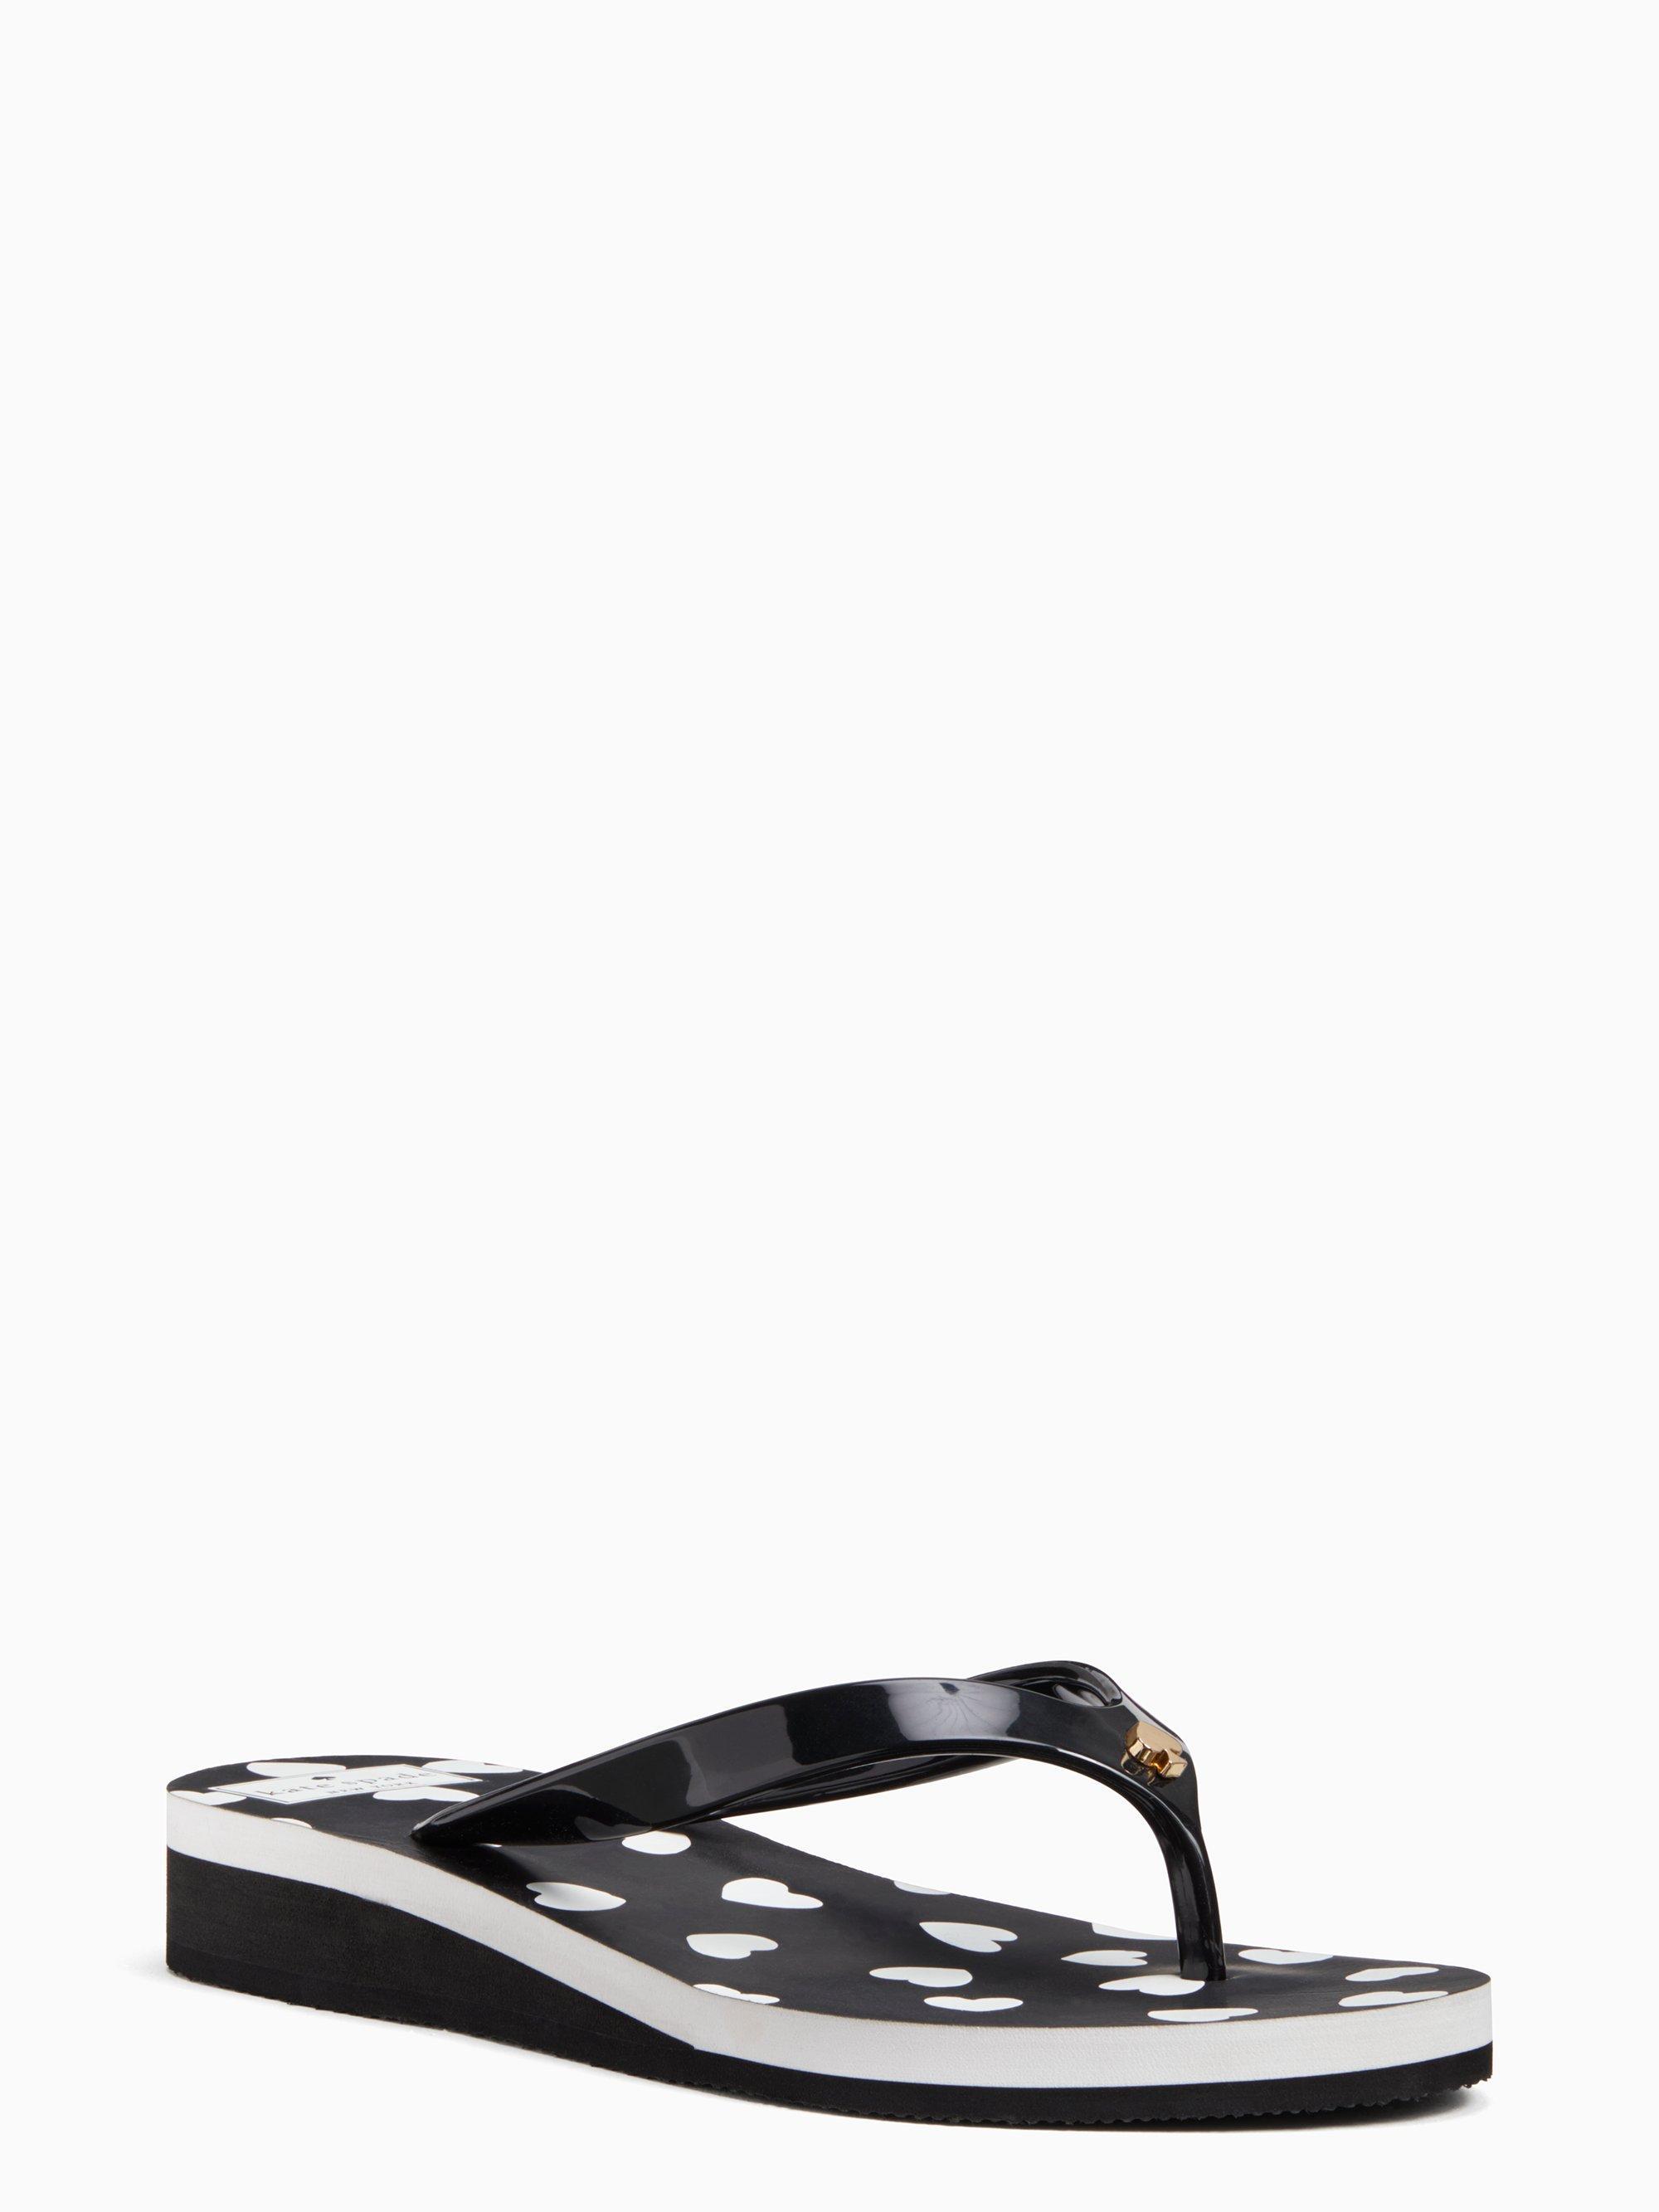 cc0b1b60ca5c Kate Spade. Women s Black Milli Flip-flop Sandals.  48 From kate spade new  york